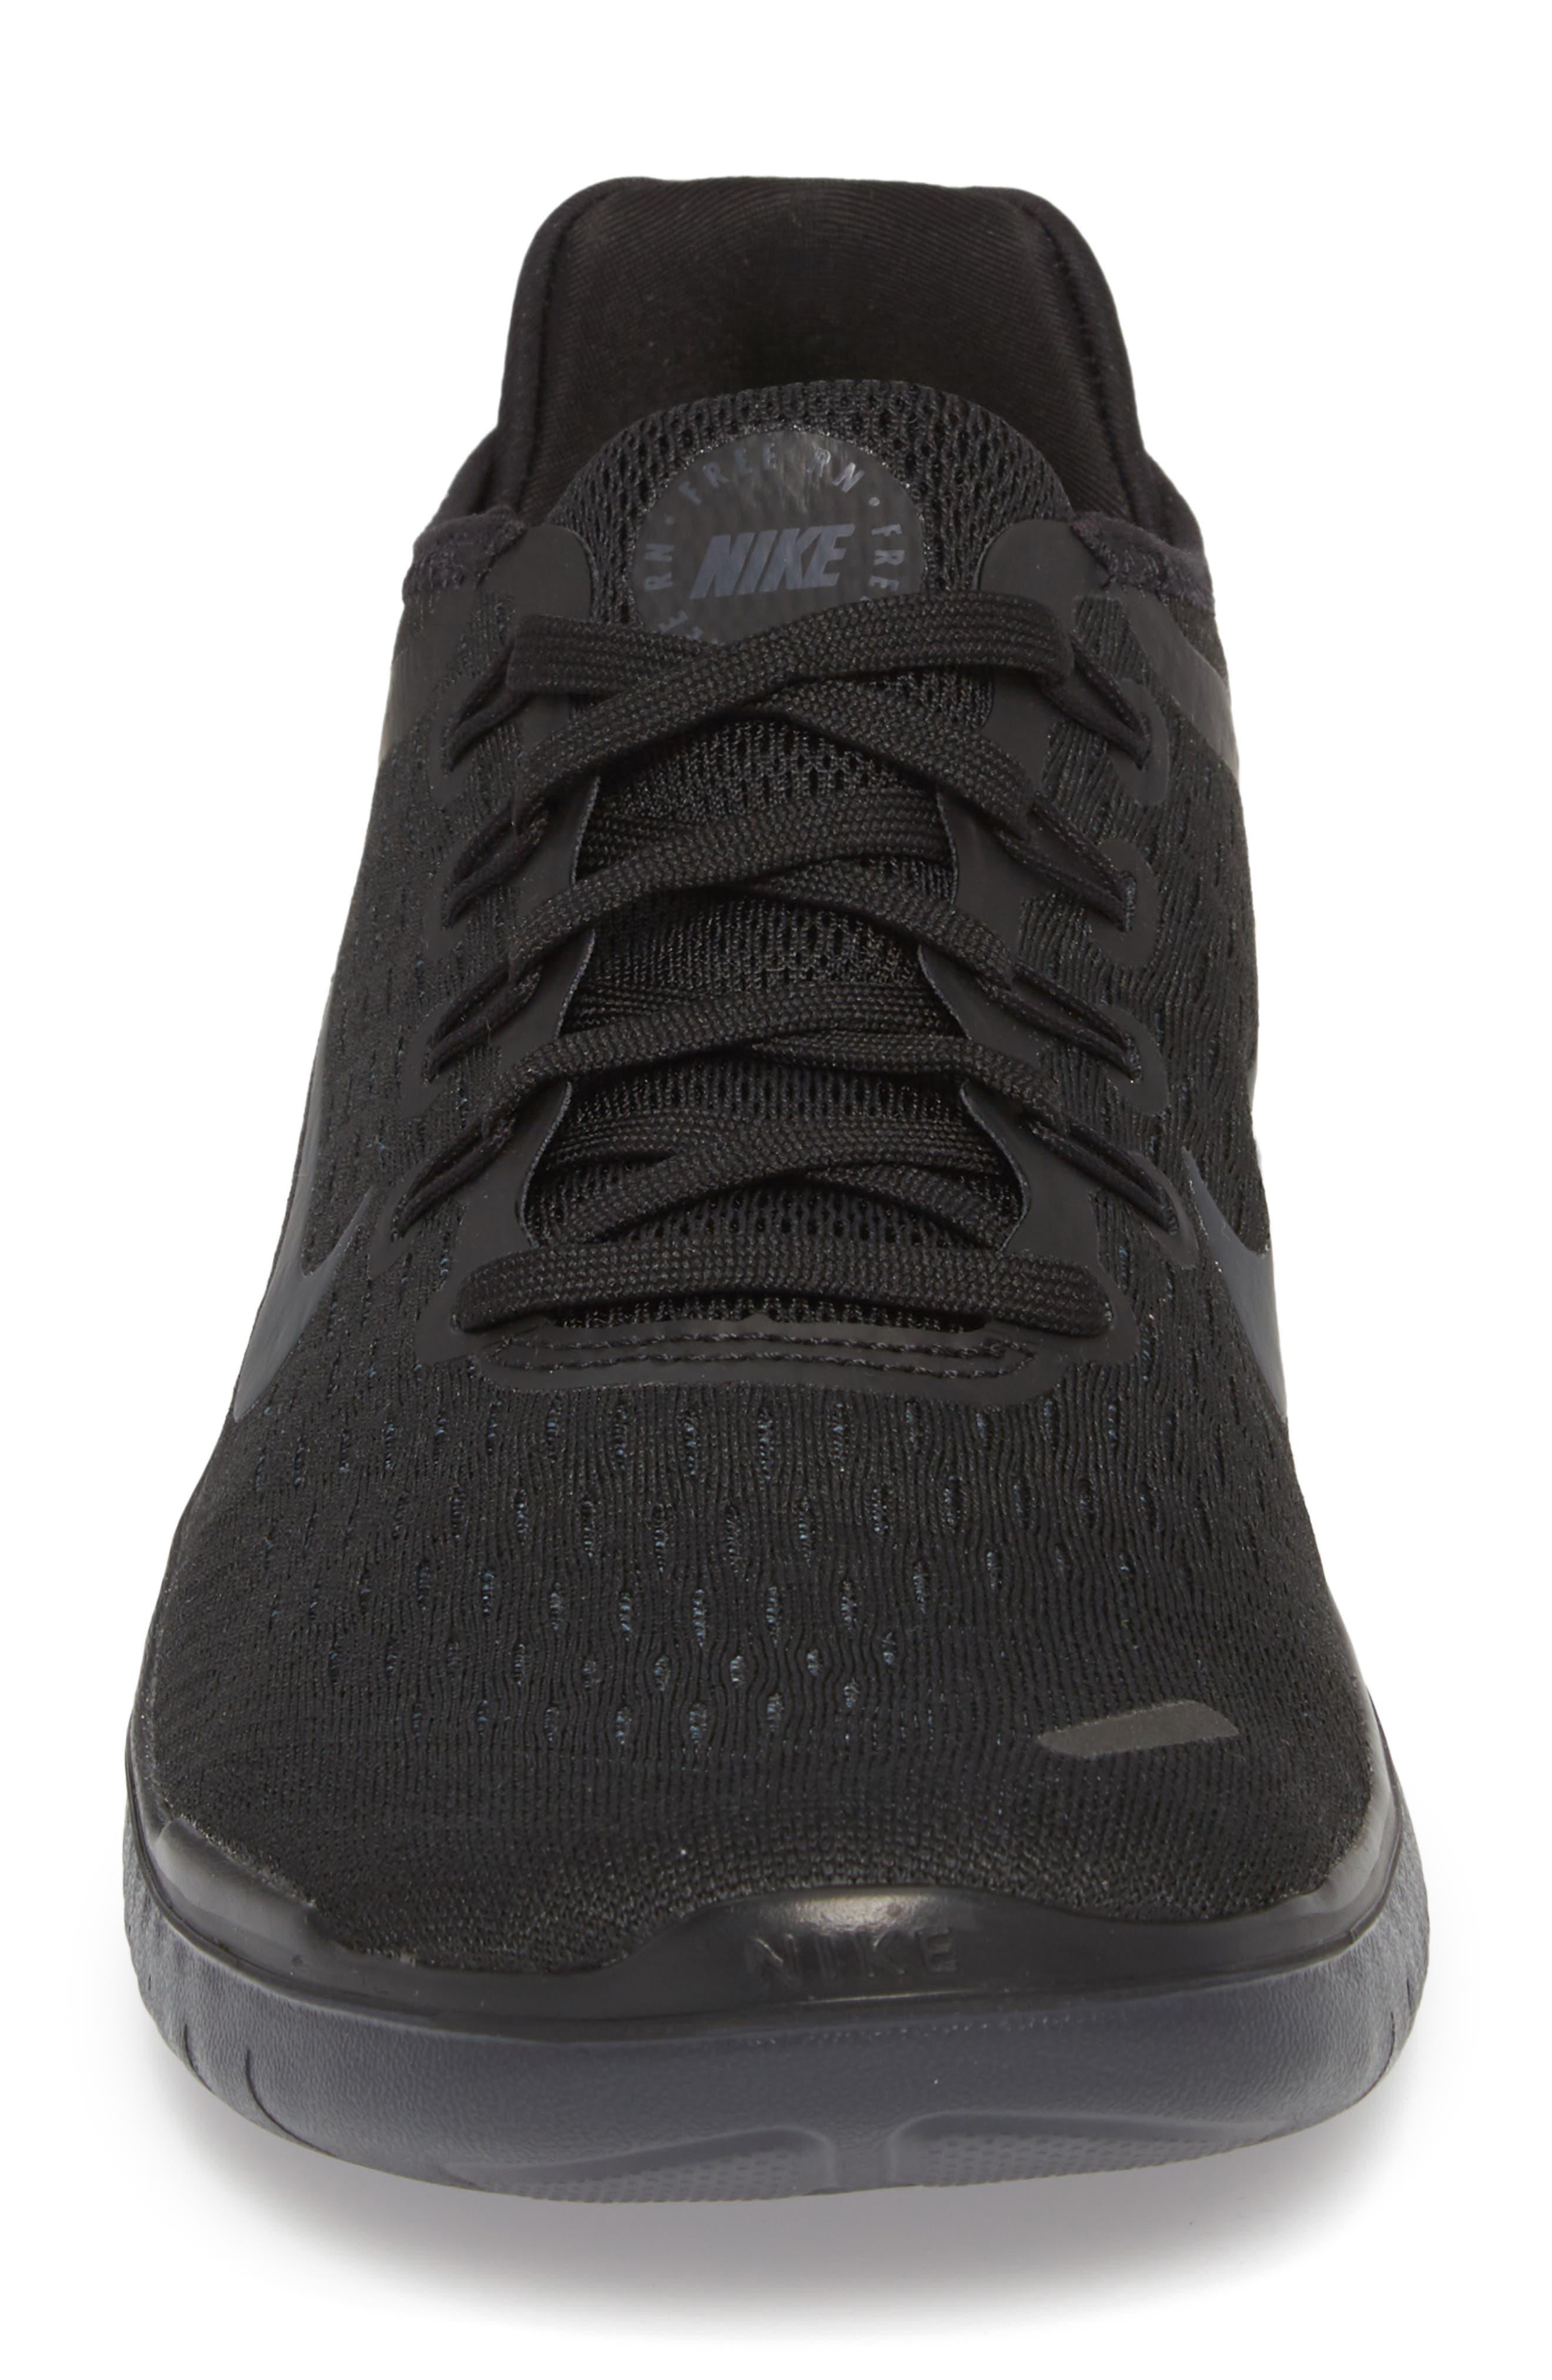 Free RN 2018 Running Shoe,                             Alternate thumbnail 4, color,                             Black/ Anthracite